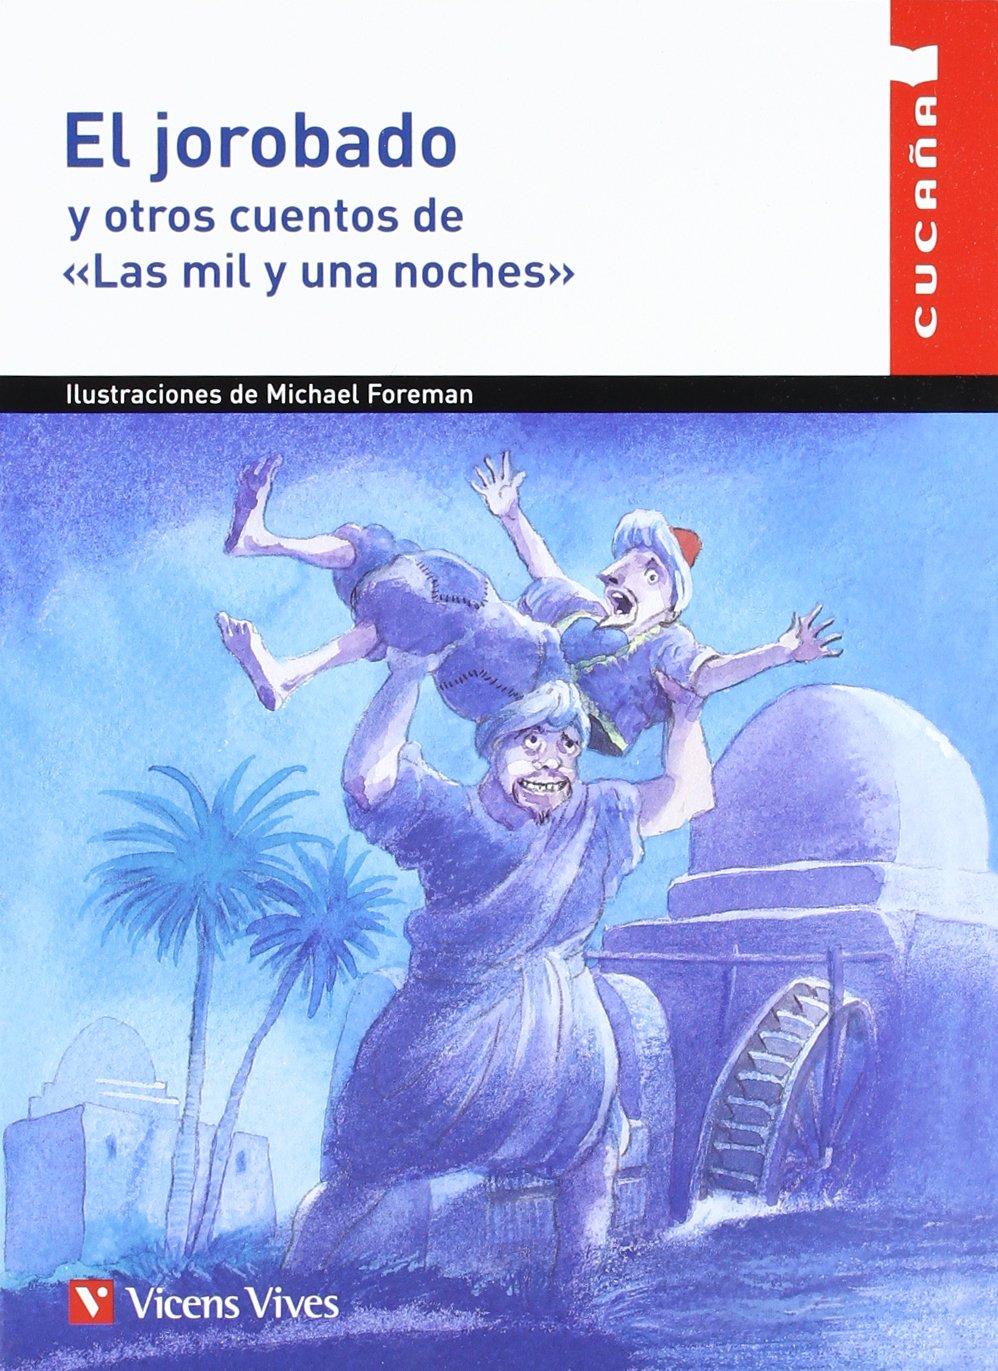 El Jorobado Y Otros Cuentos De Las Mil Y Una Noches / The Hunchback and other stories from a thousand and one nights (Cucana Literature) (Spanish Edition) pdf epub